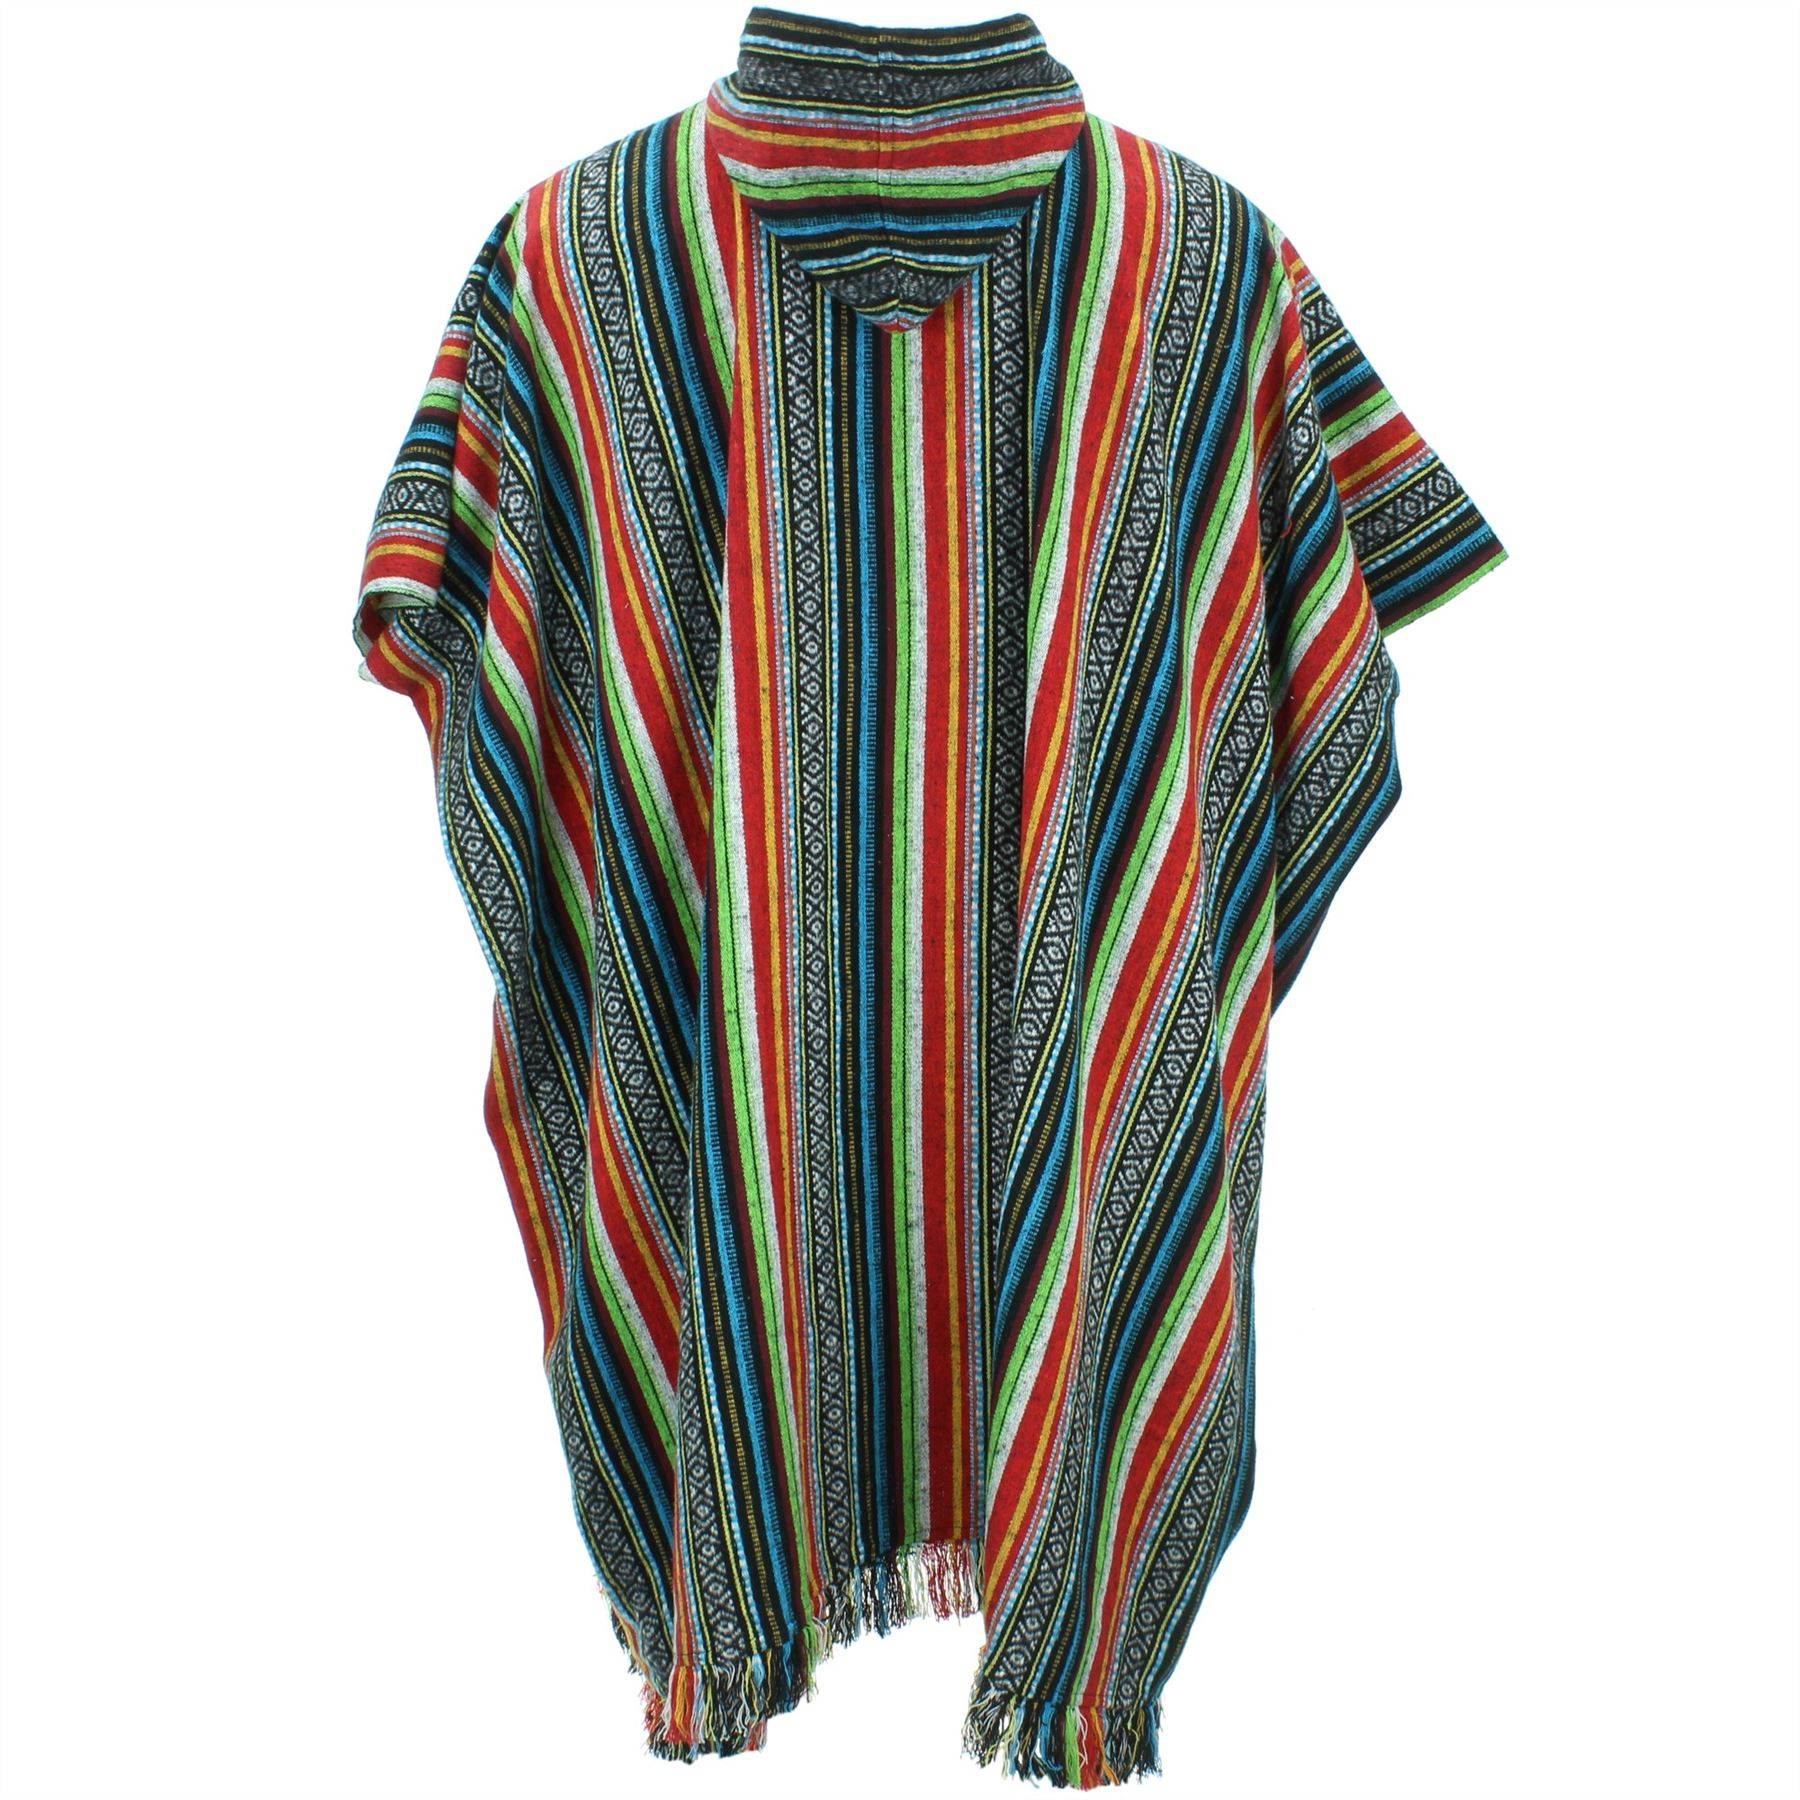 Poncho-Hooded-Cape-Cotton-Warm-Festival-Long-Woven-Rainbow-Men-Women thumbnail 7